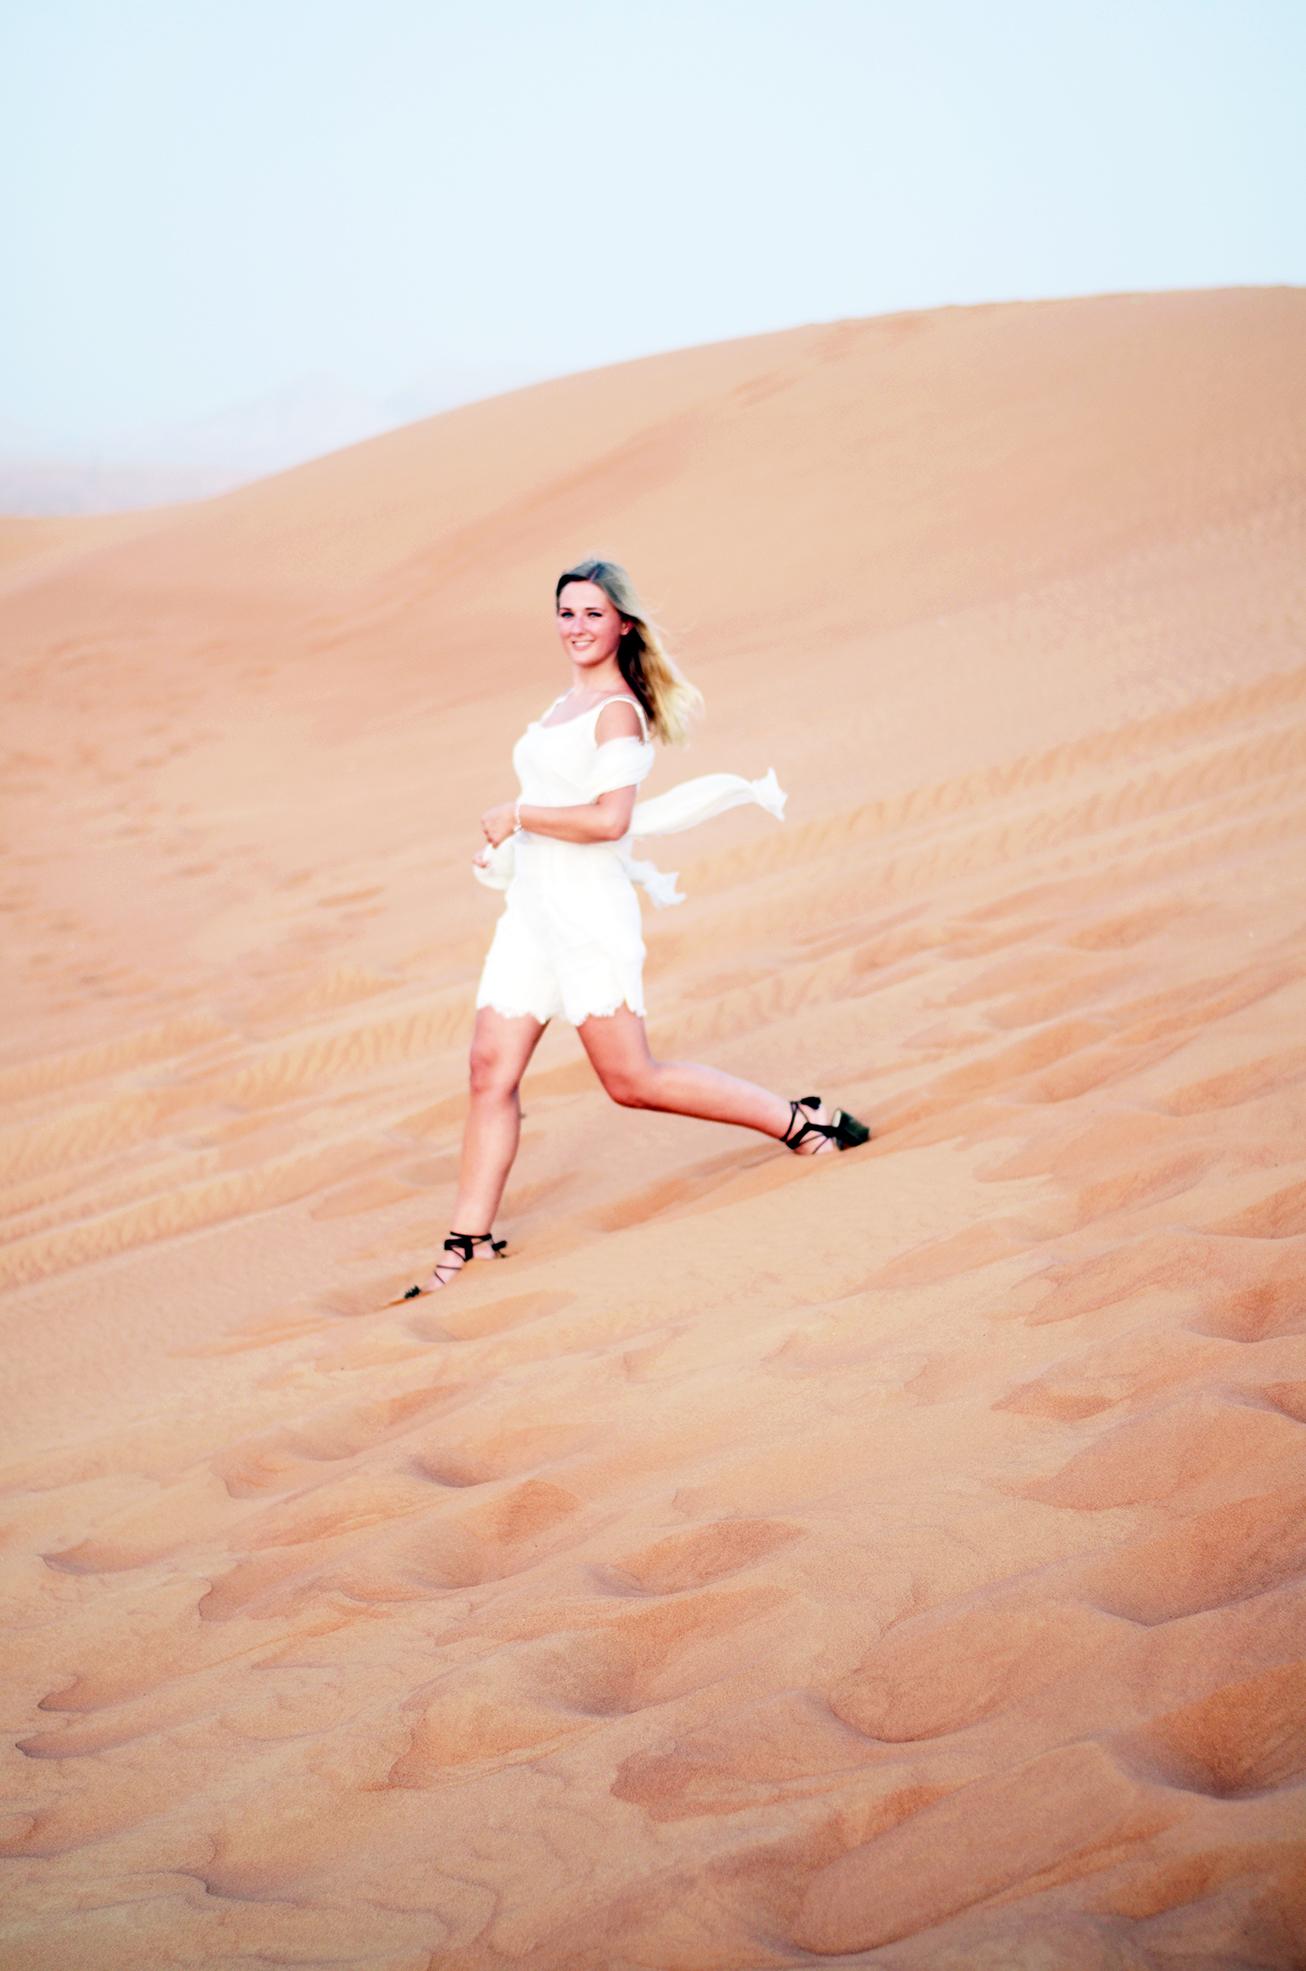 Thomas_Sabo_Kompass_Charm_Club_Dubai_Wüste